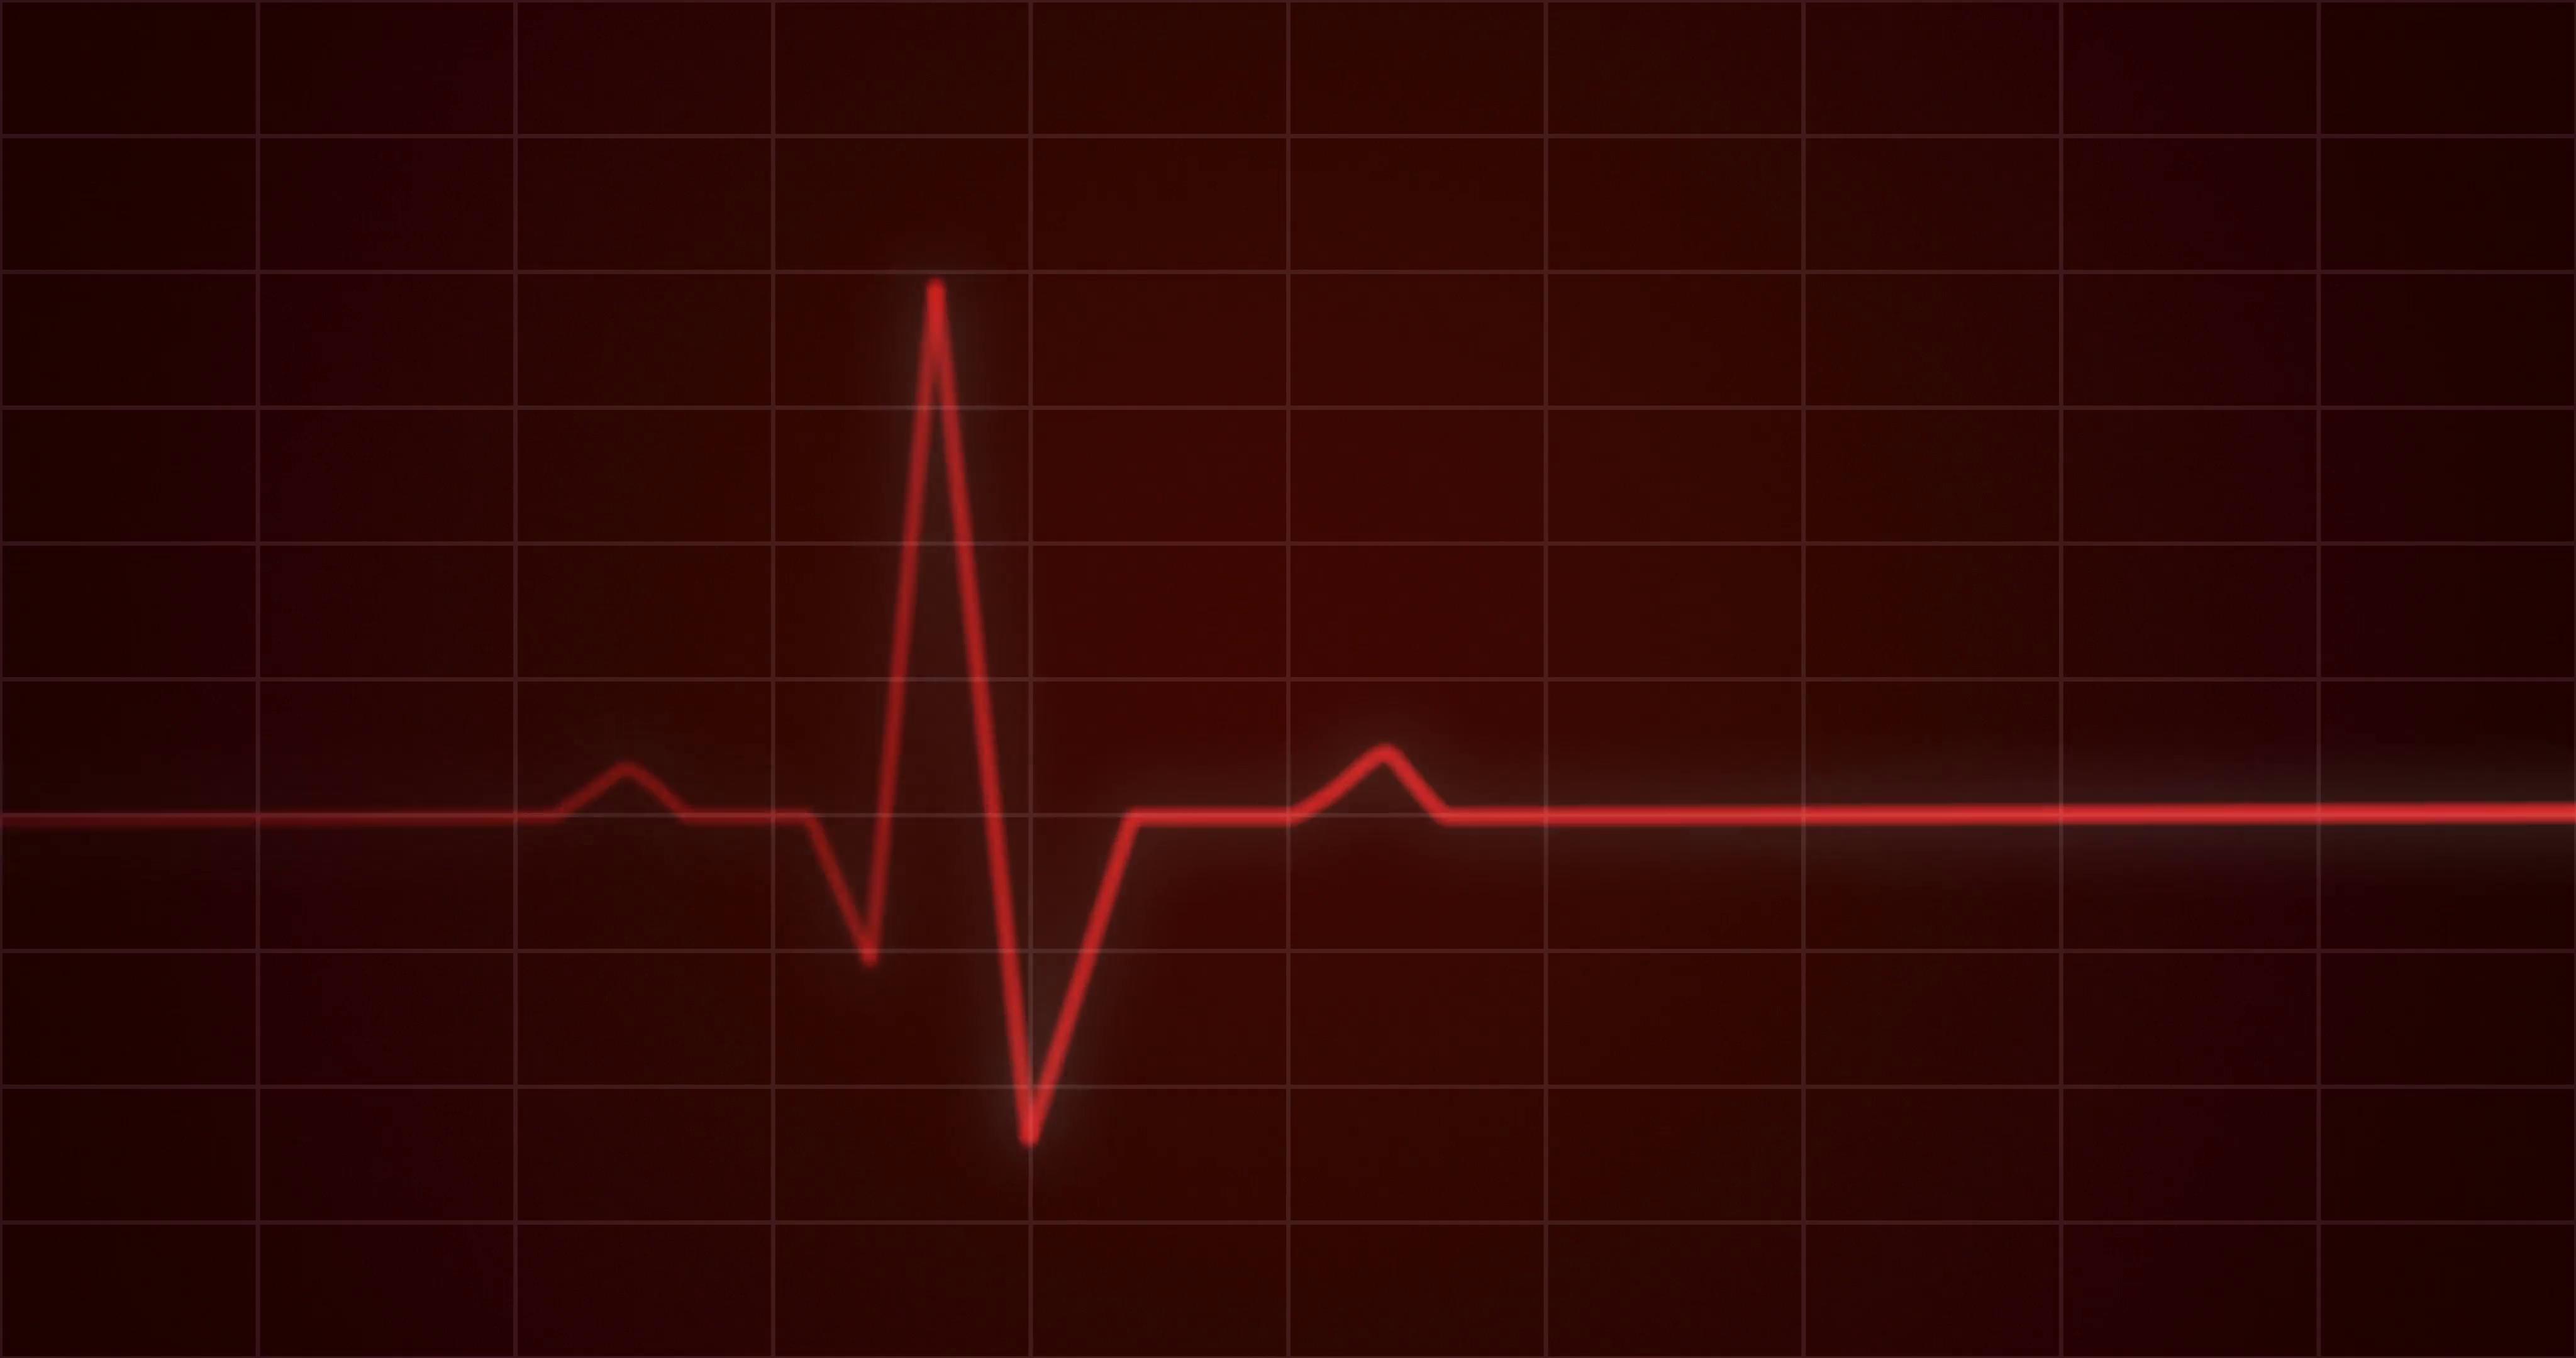 Conceptual animation illustrating an ECG or EKG heartbeat cardiogram ...